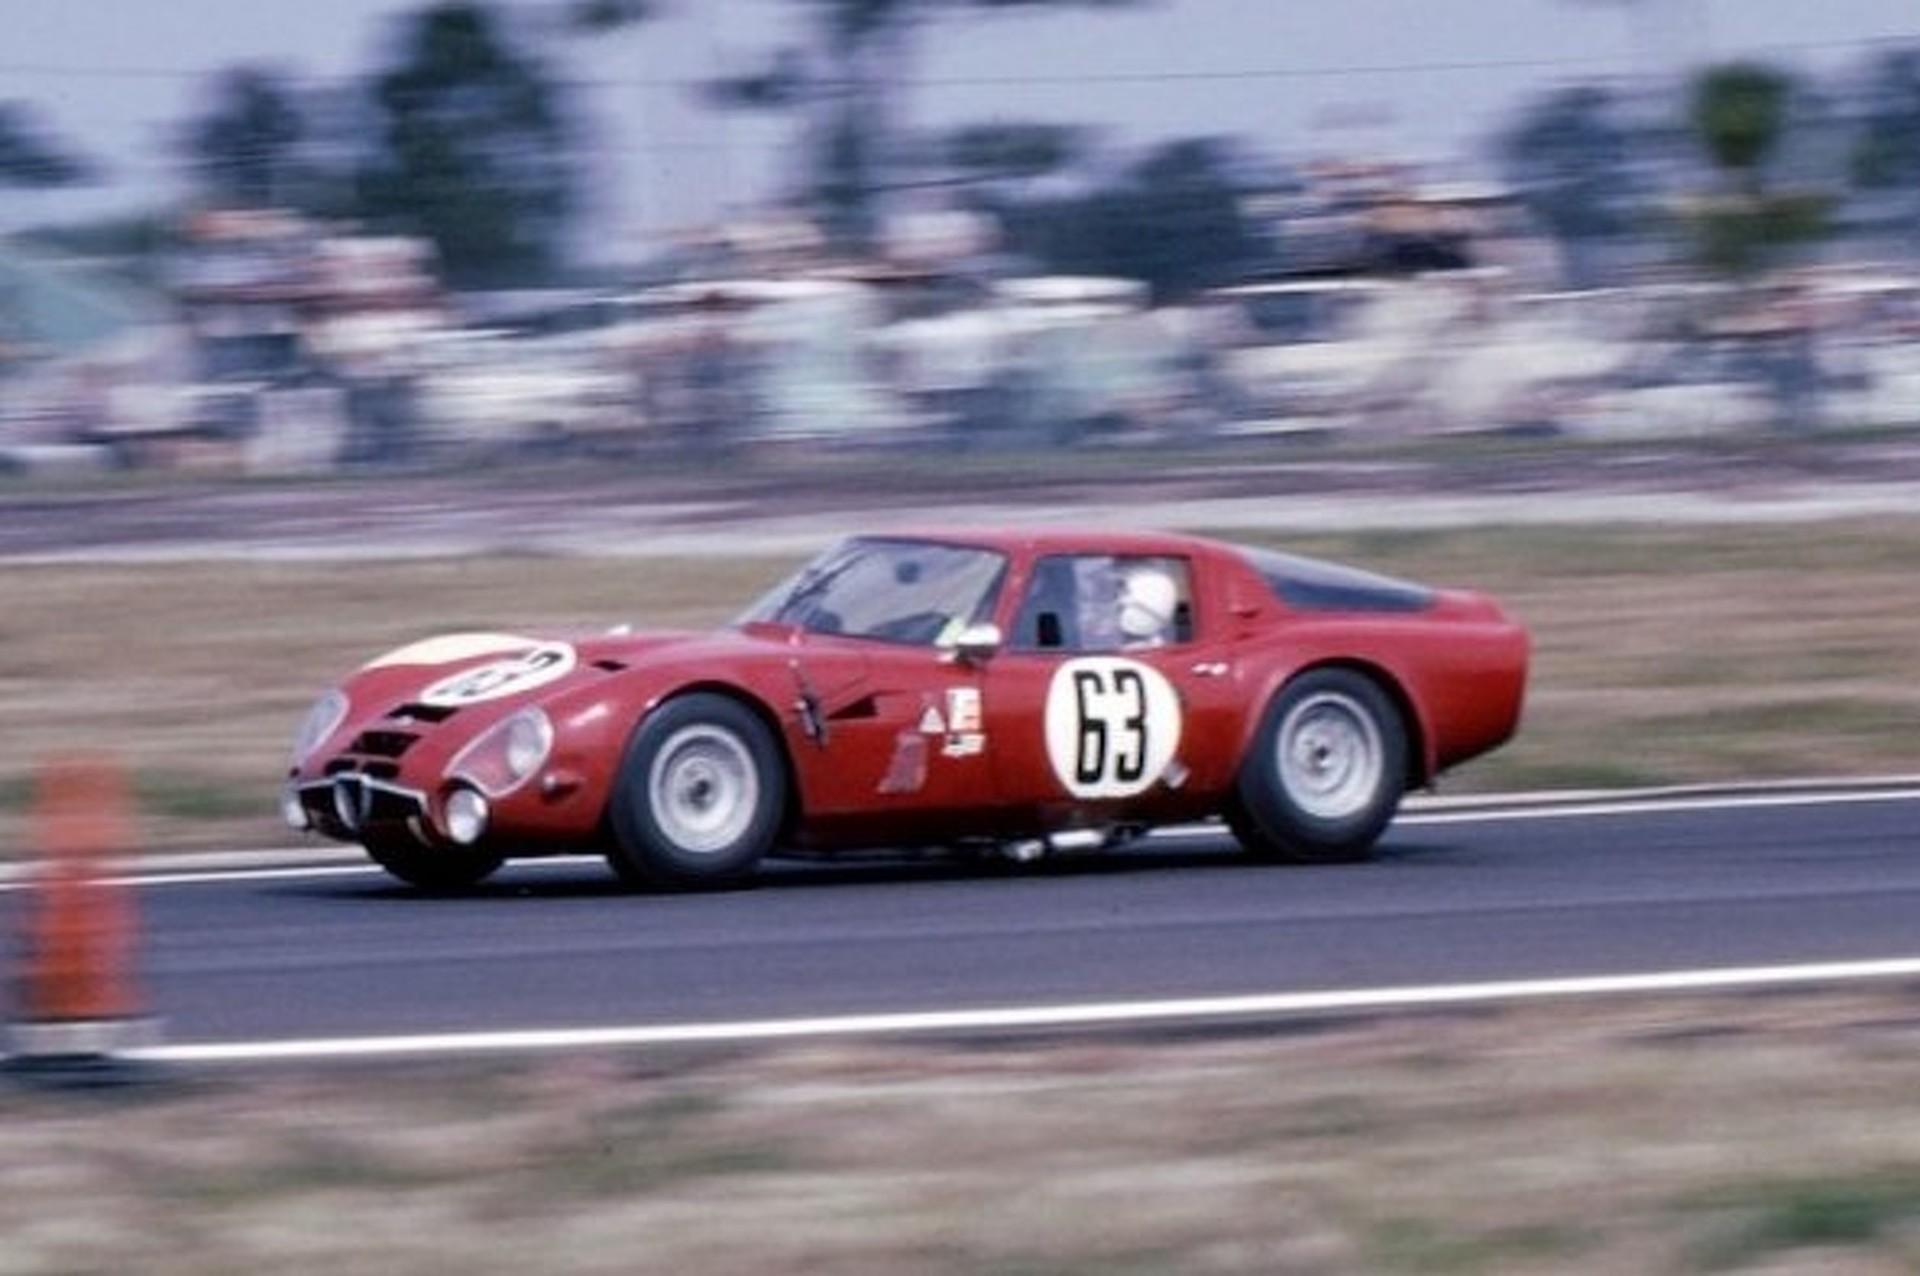 Sebring Raceway: A Brief History